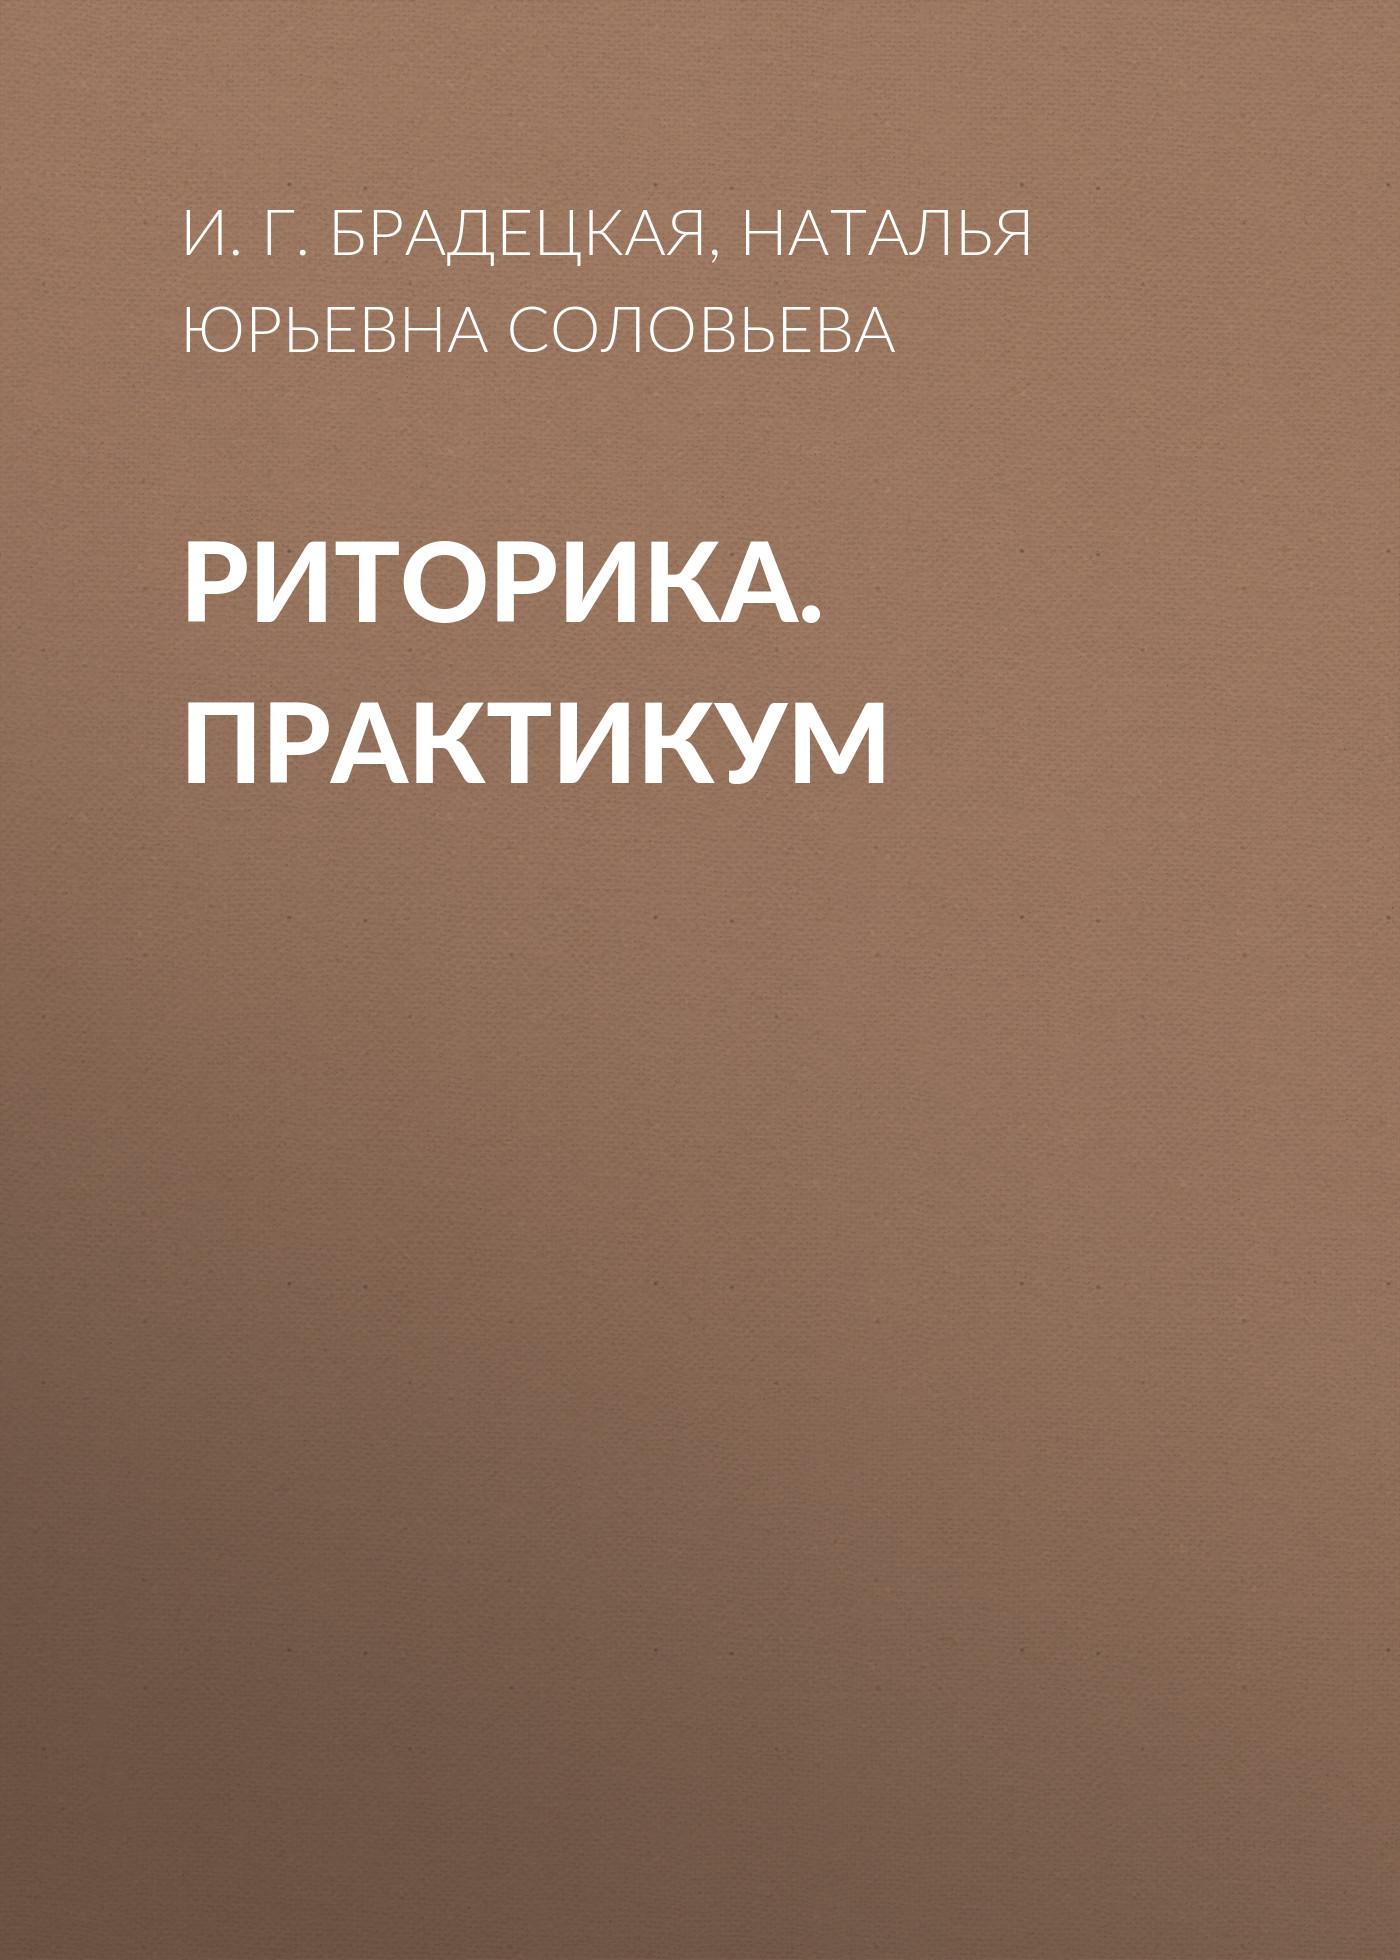 Н. Ю. Соловьева Риторика. Практикум цена